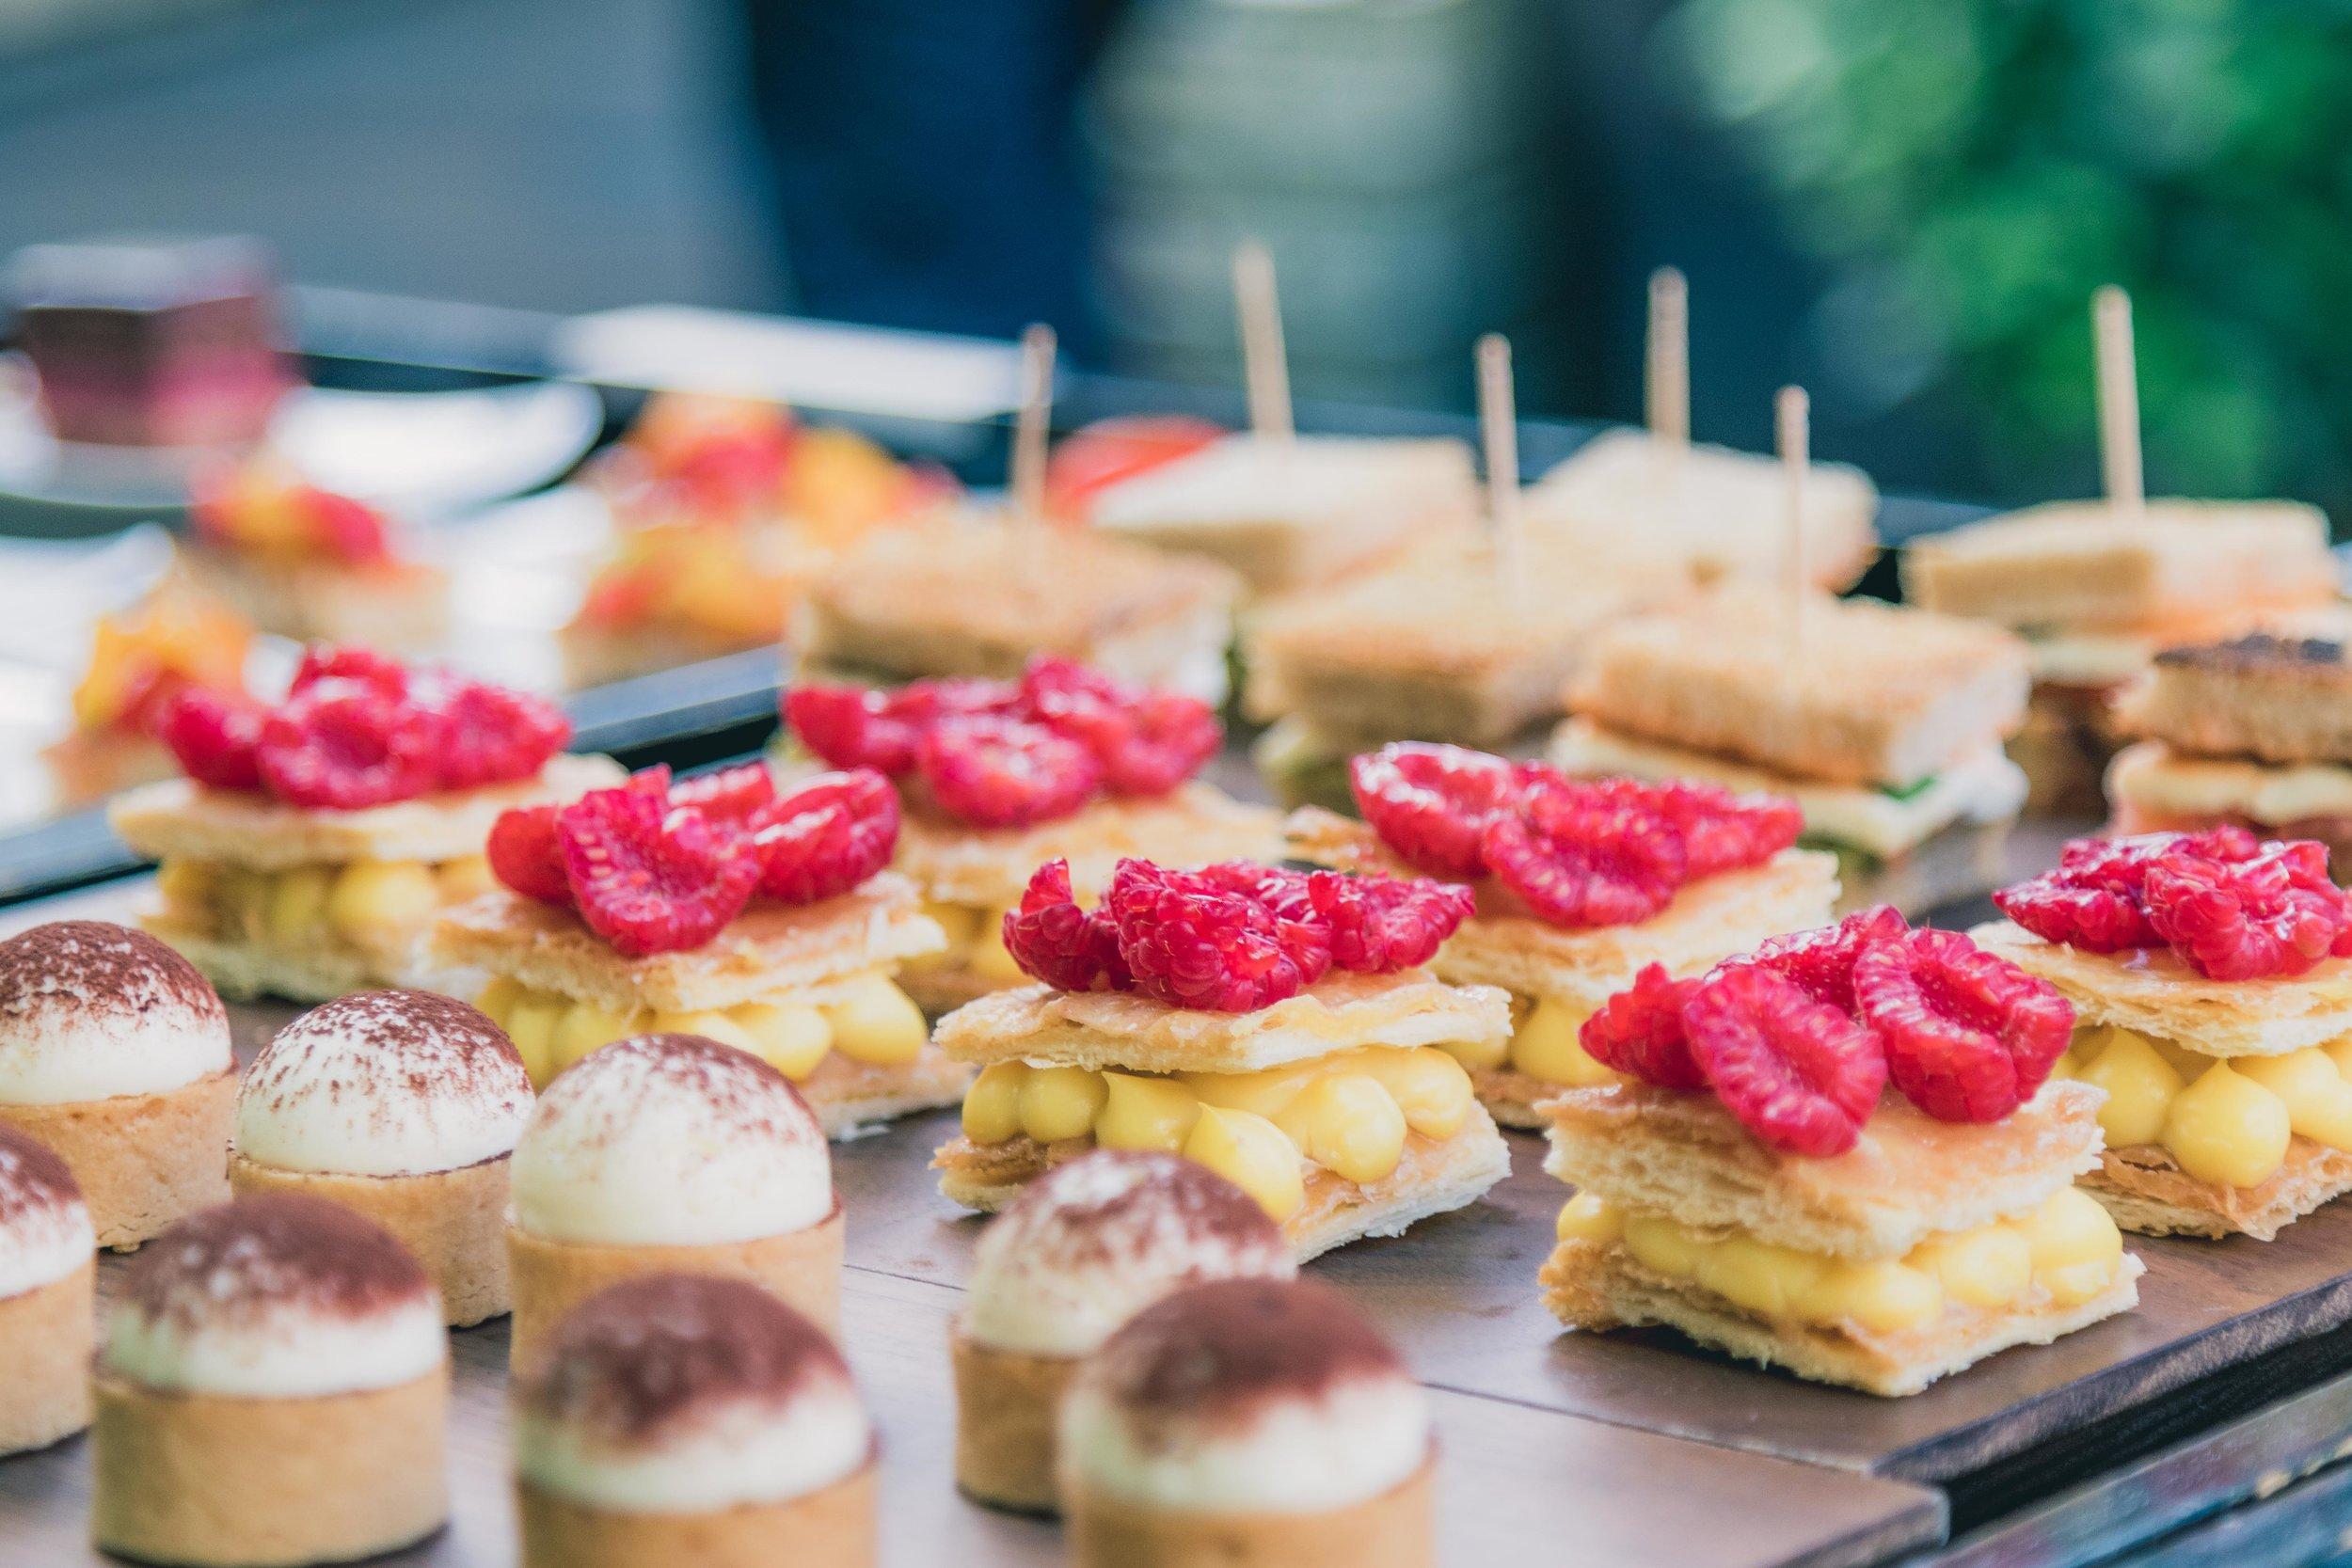 5 Bulgari hotel garden party desserts.jpg